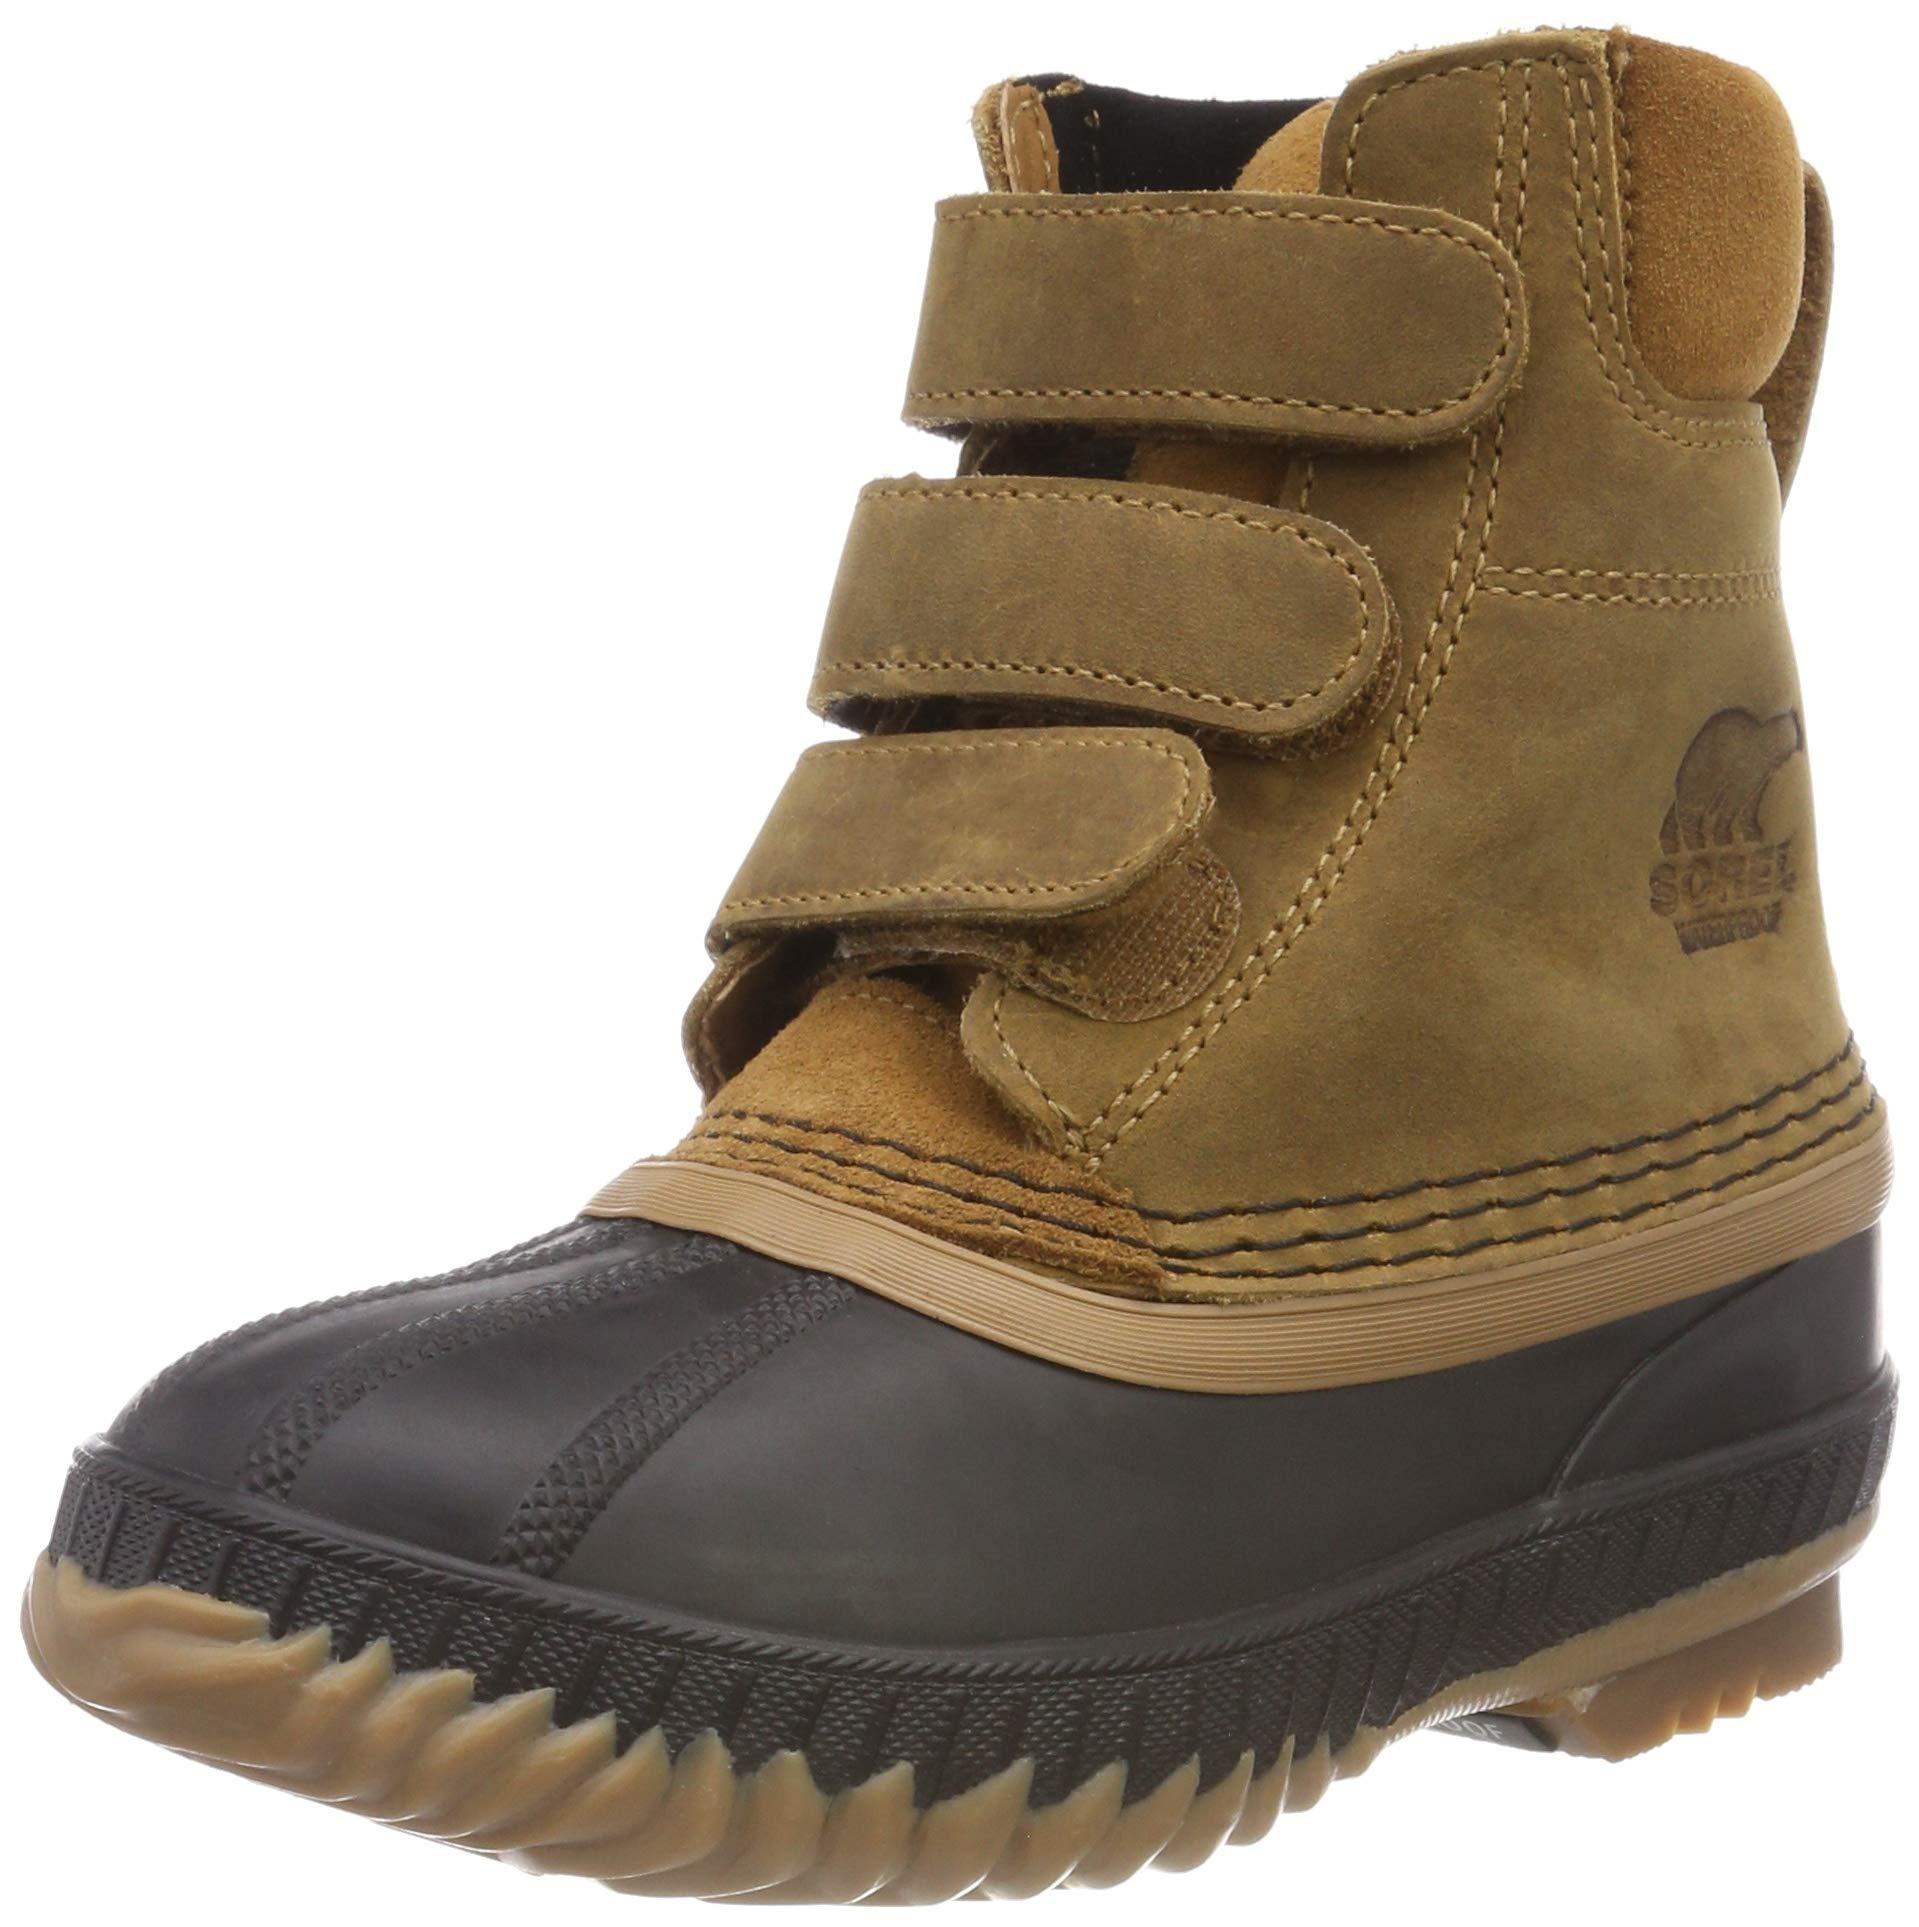 Sorel Boys' Children's Cheyanne II Velcro Snow Boot, elk, Black, 9 M US Little Kid